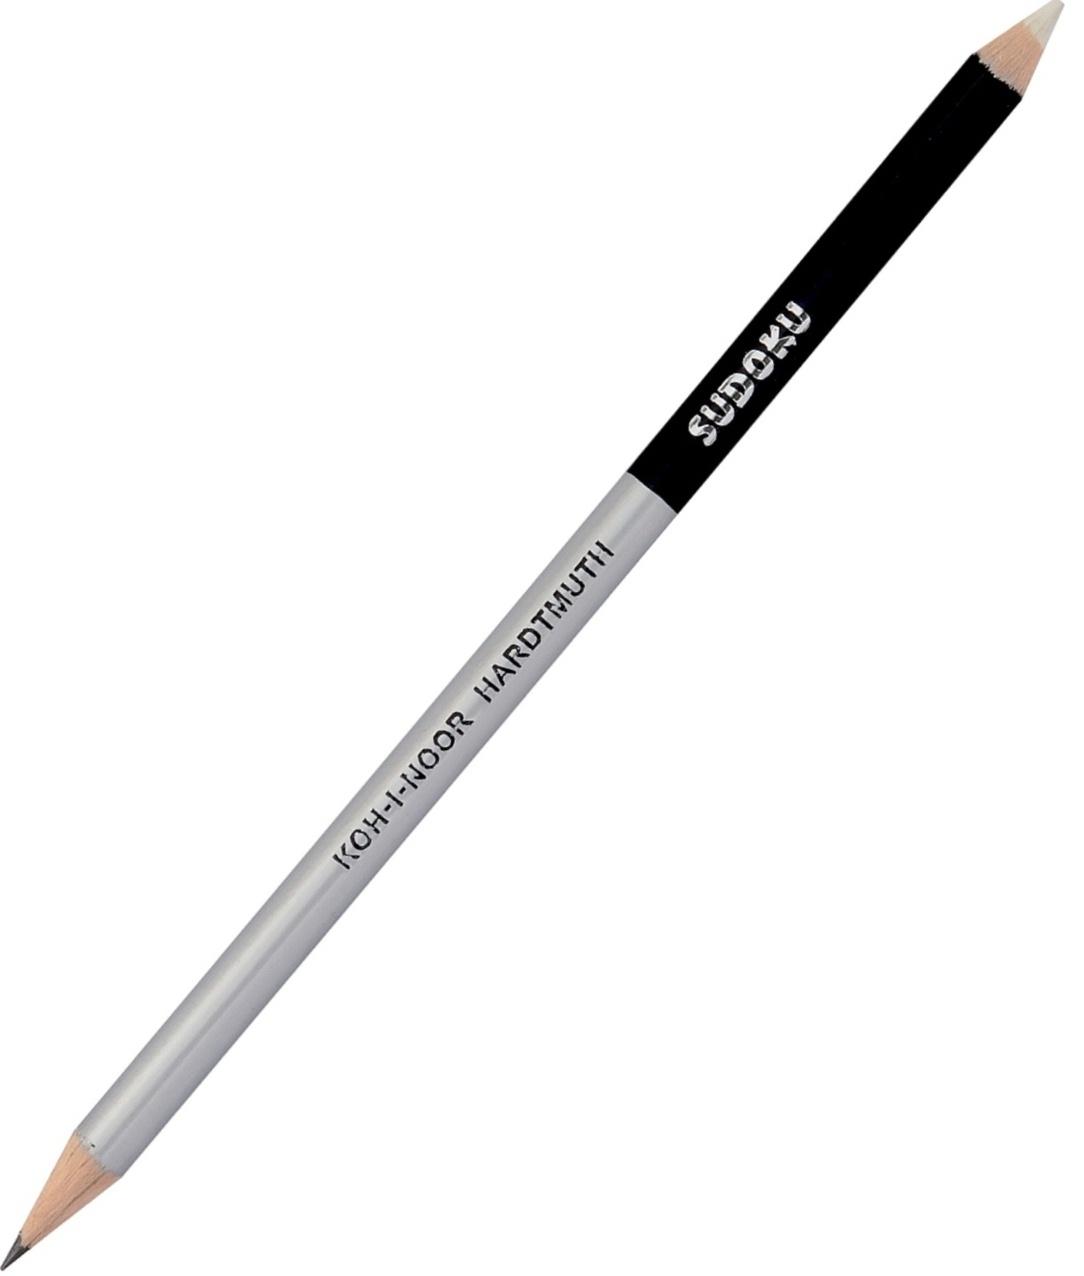 Creion cu mina grafit + radiera 17.5cm cu 2 capete KOH-I-NOOR Sudoku